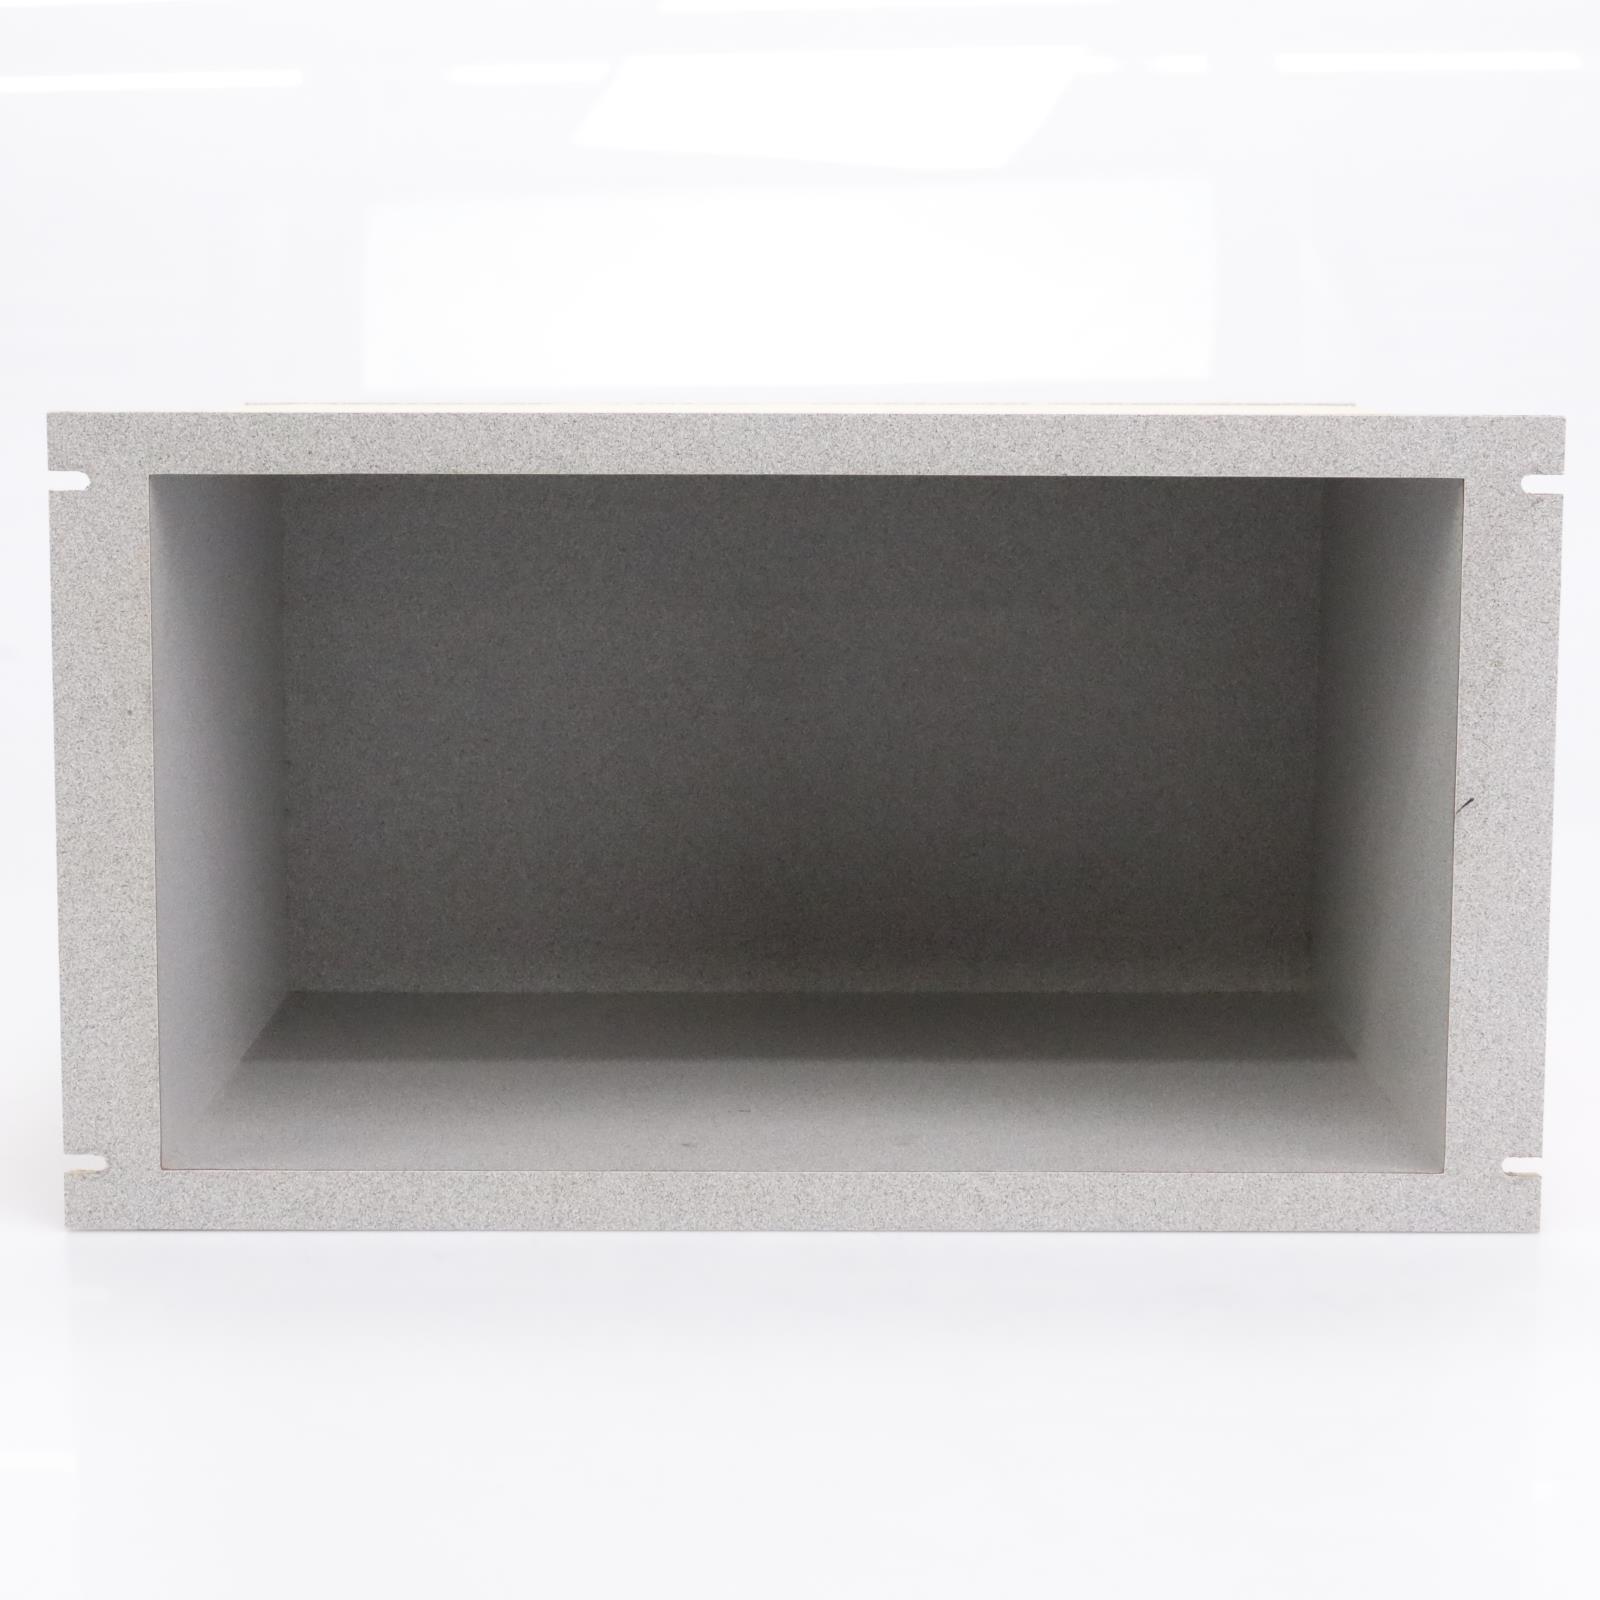 Unbranded 6-Unit Wooden Laminate Rack Mount Shelf Box #43278